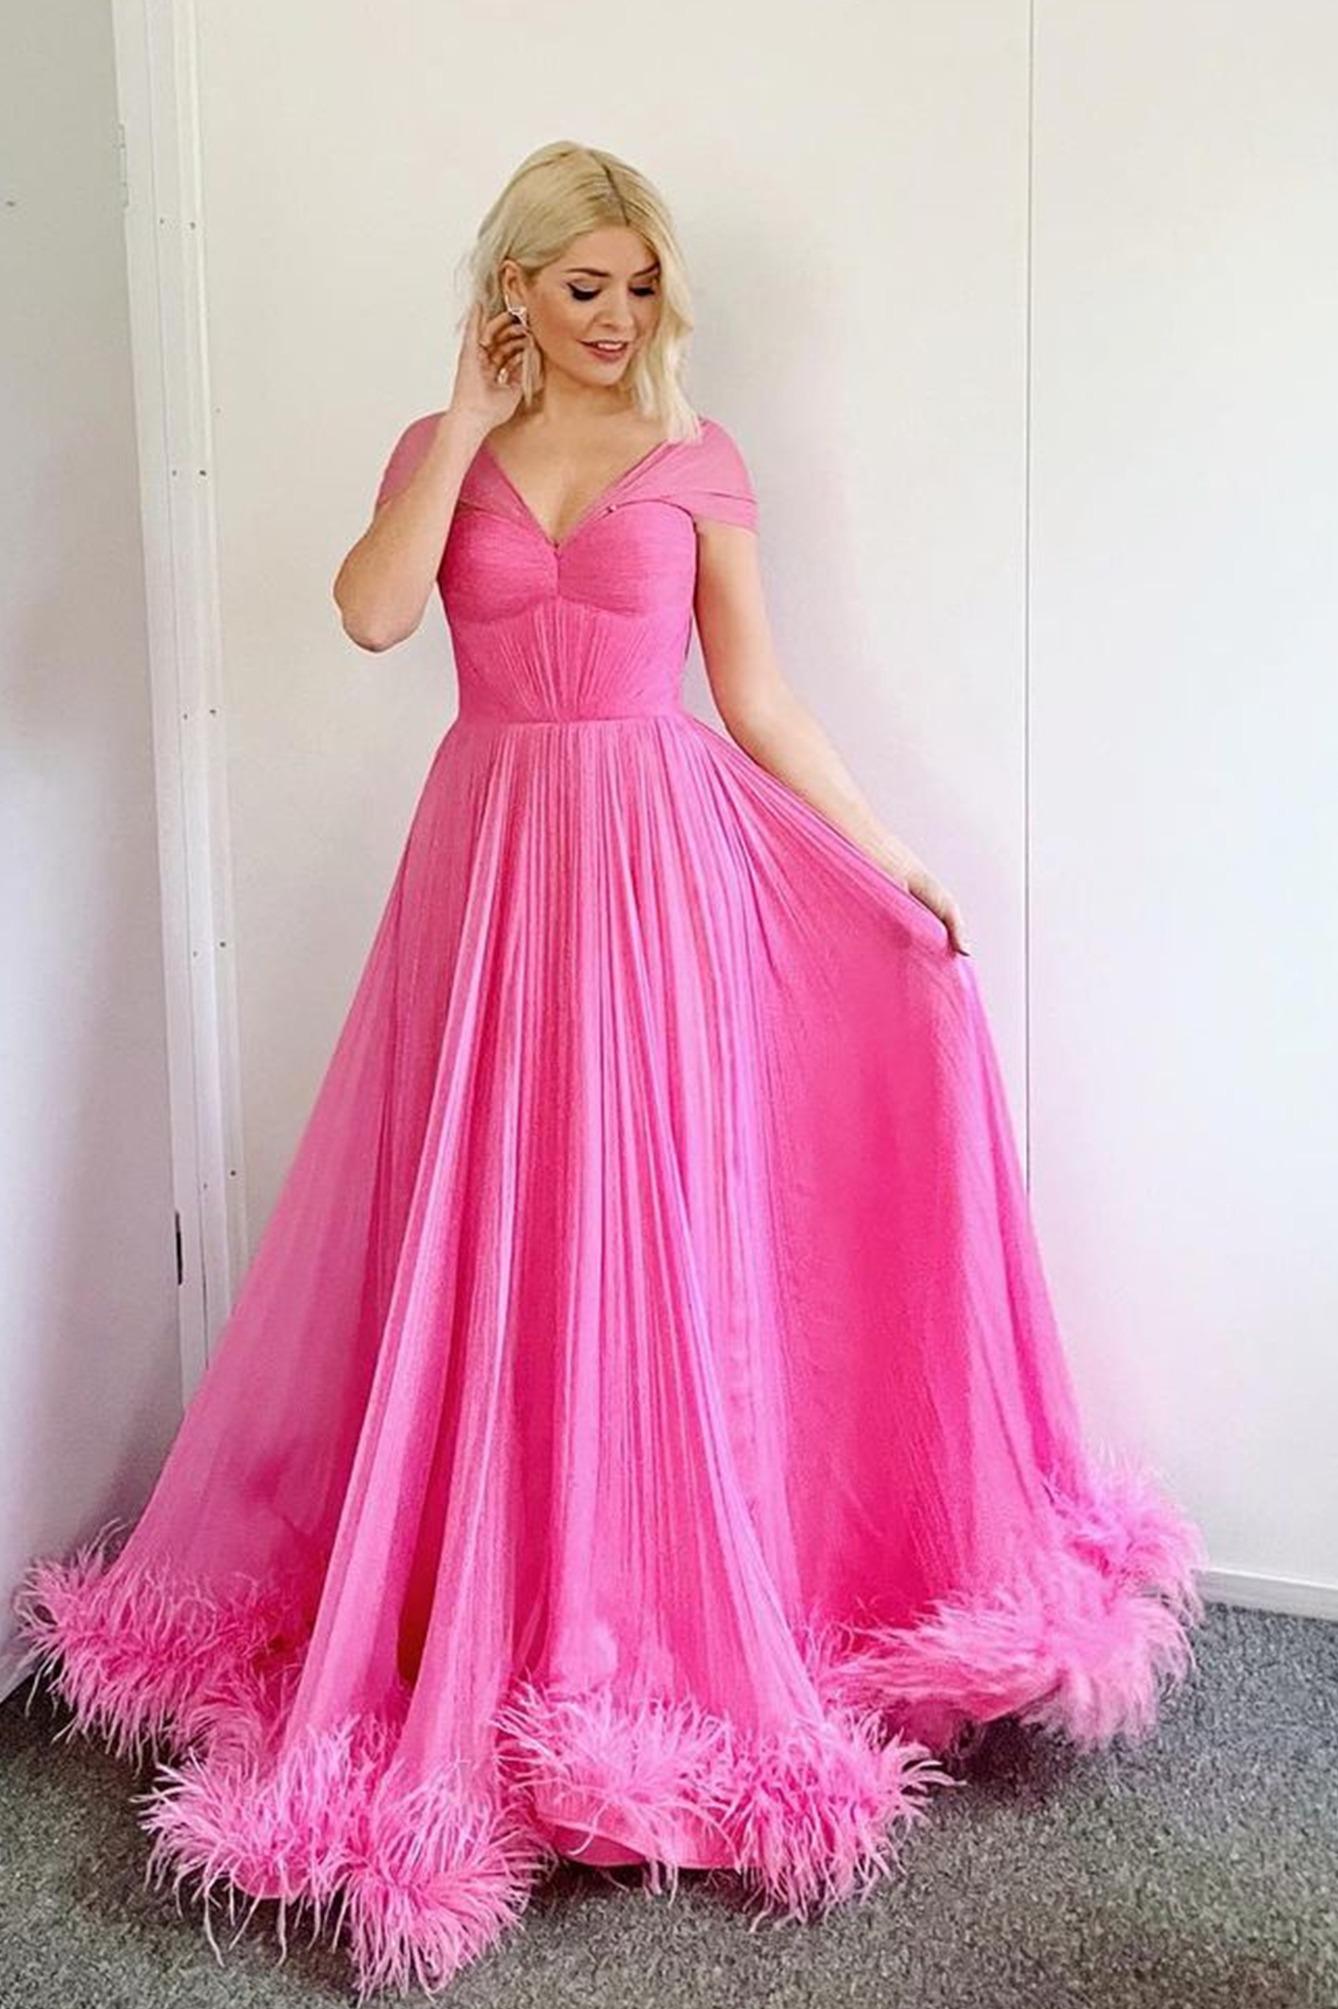 Draped corset romantic gown